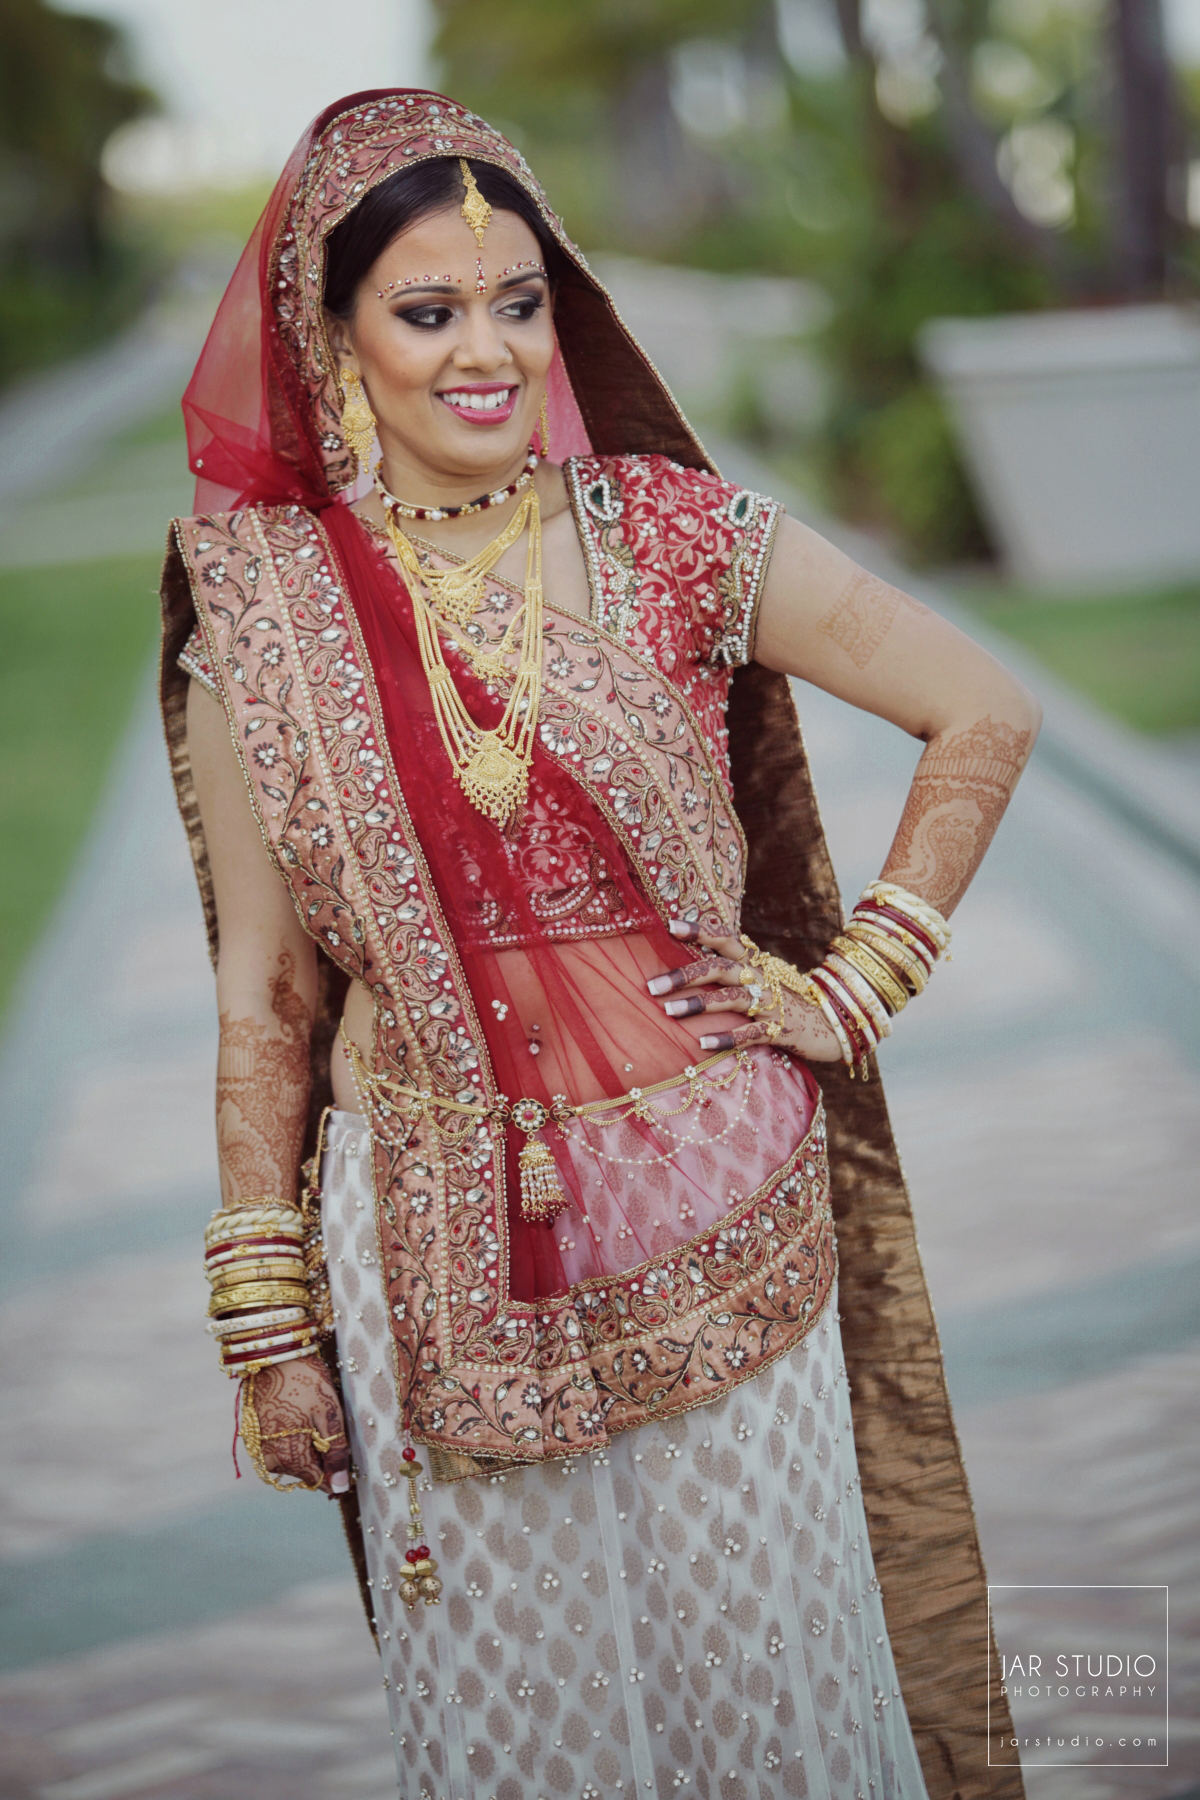 19-bride-saree-jarstudio-indian-weddings-photography-orlando-fl.JPG